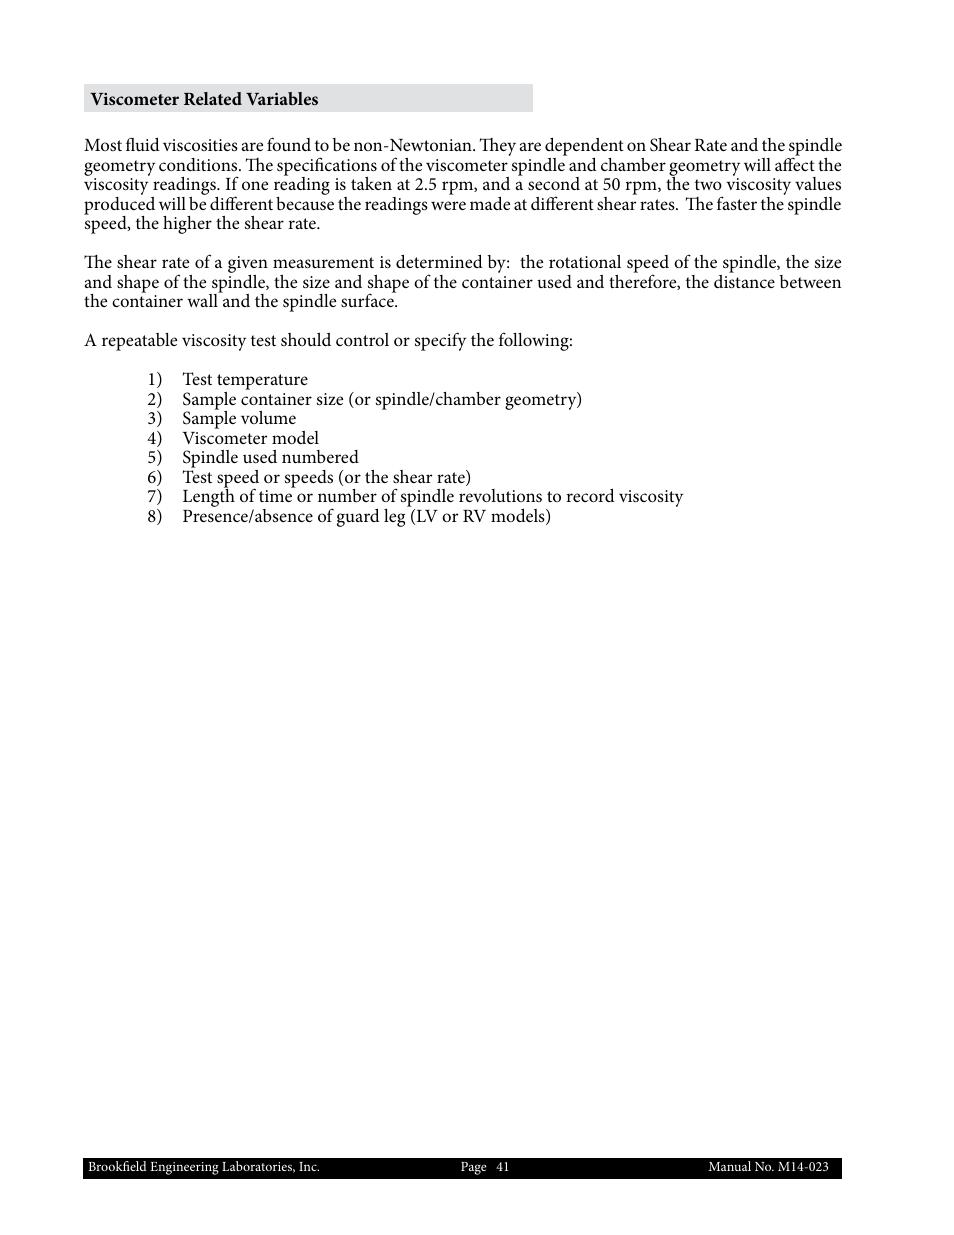 brookfield dv1 viscometer user manual page 41 63 original mode rh manualsdir com Cartoon Manual Service Manuals